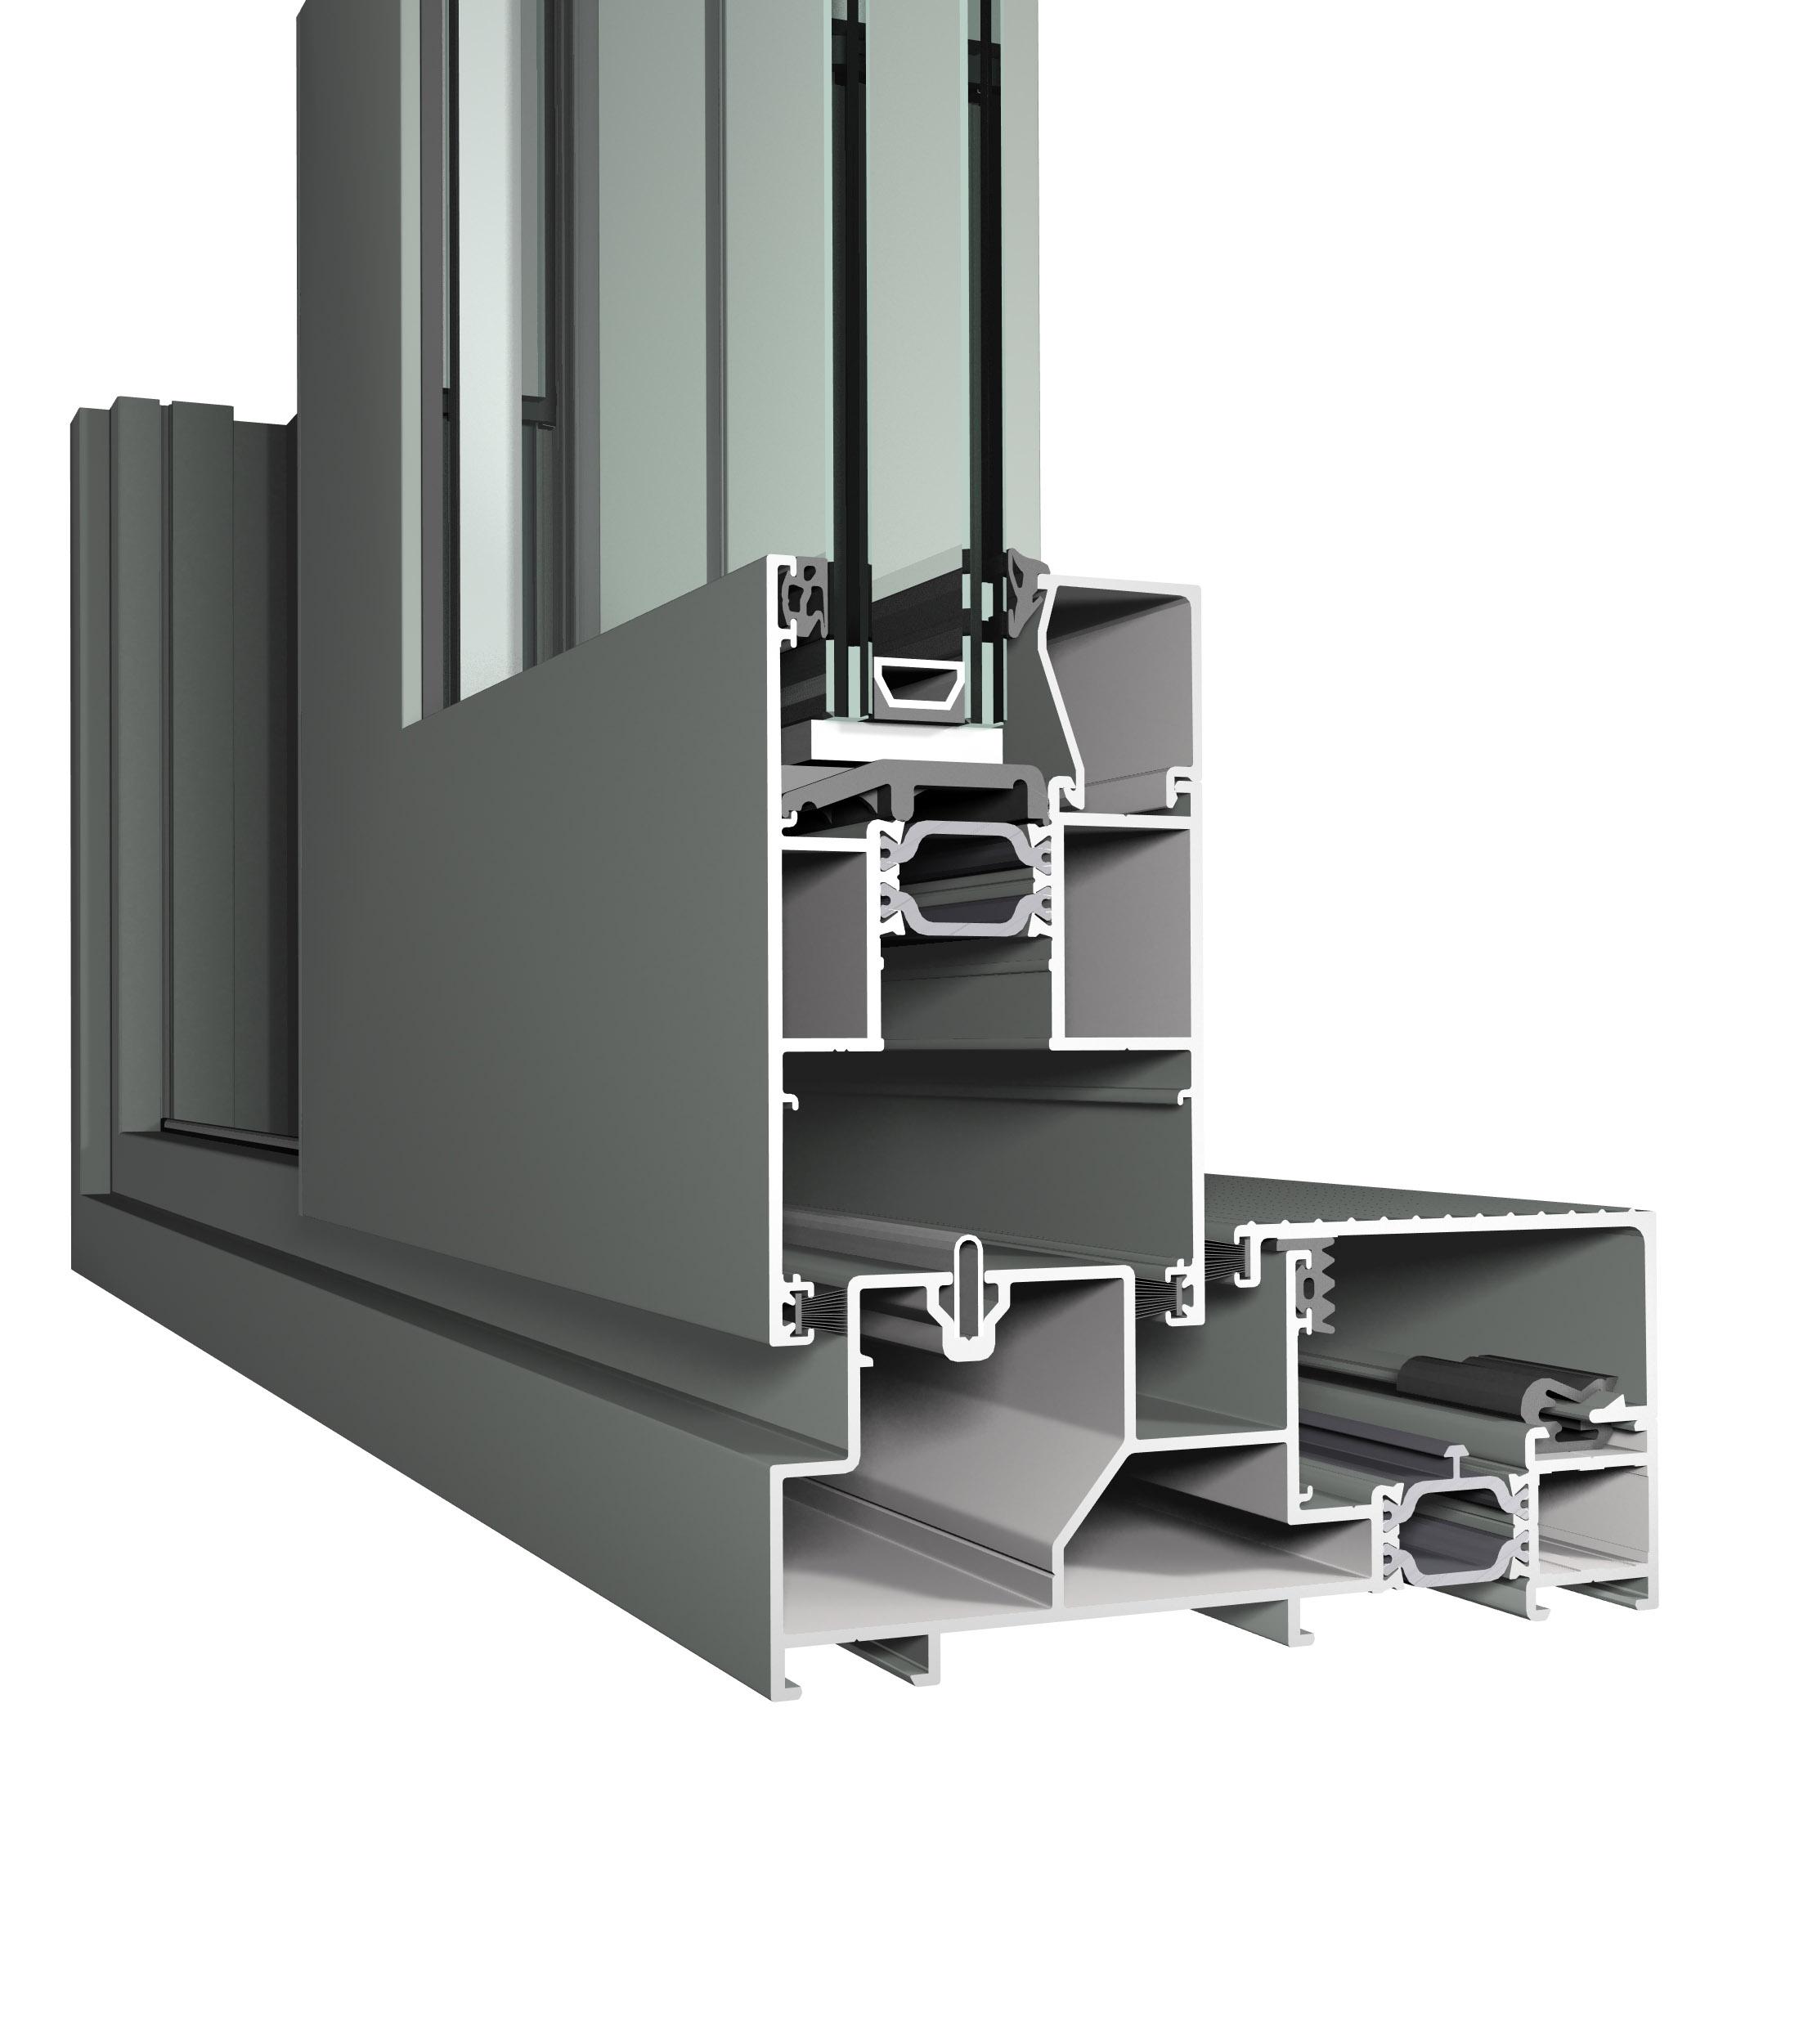 portes coulissantes alupar l 39 art du ch ssis aluminium. Black Bedroom Furniture Sets. Home Design Ideas